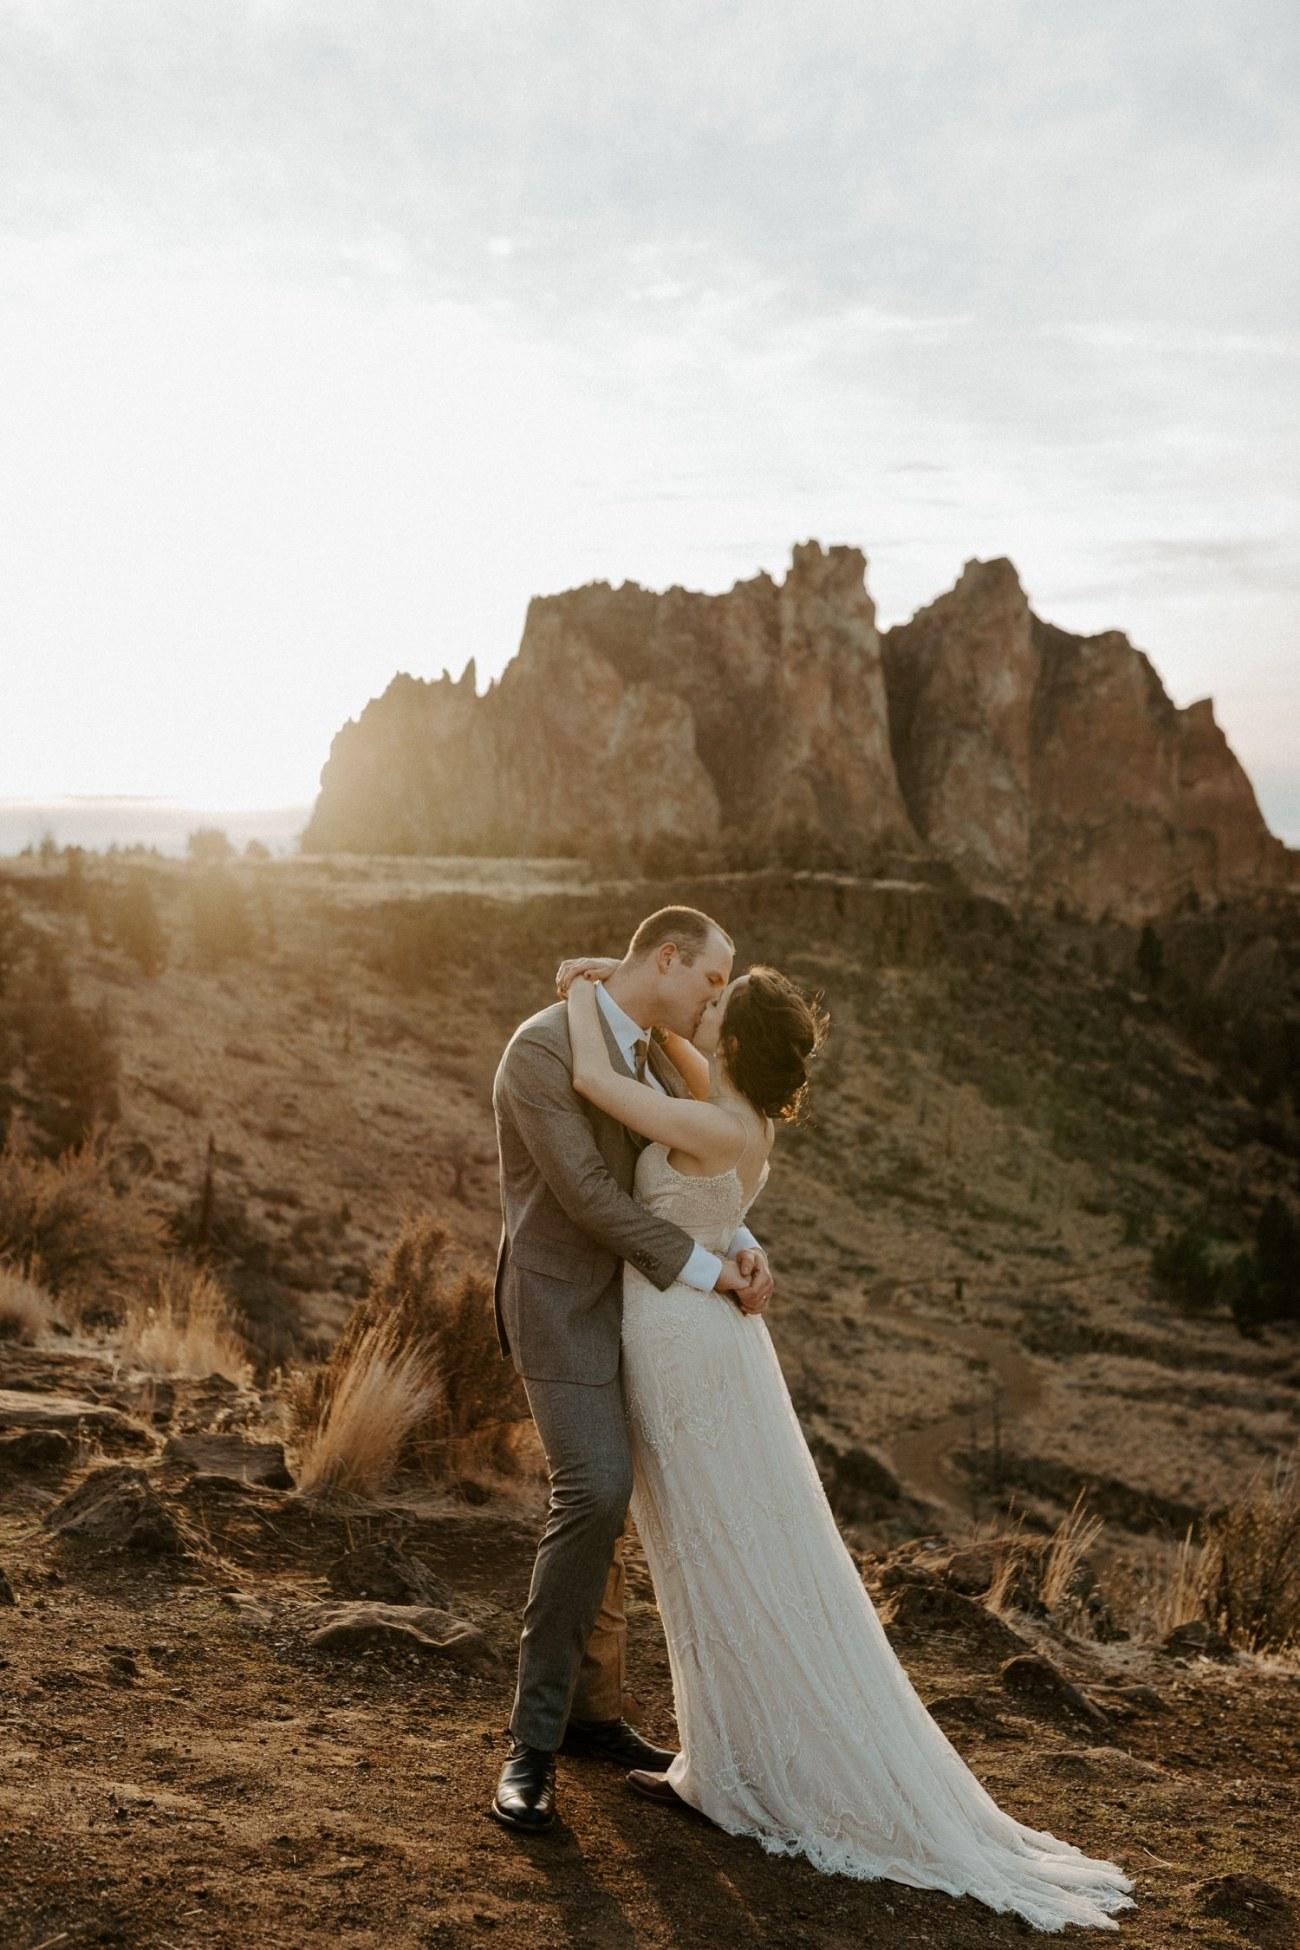 Smith Rock State Park Elopement Bend Oregon Elopement Photographer Anais Possamai Photography 016